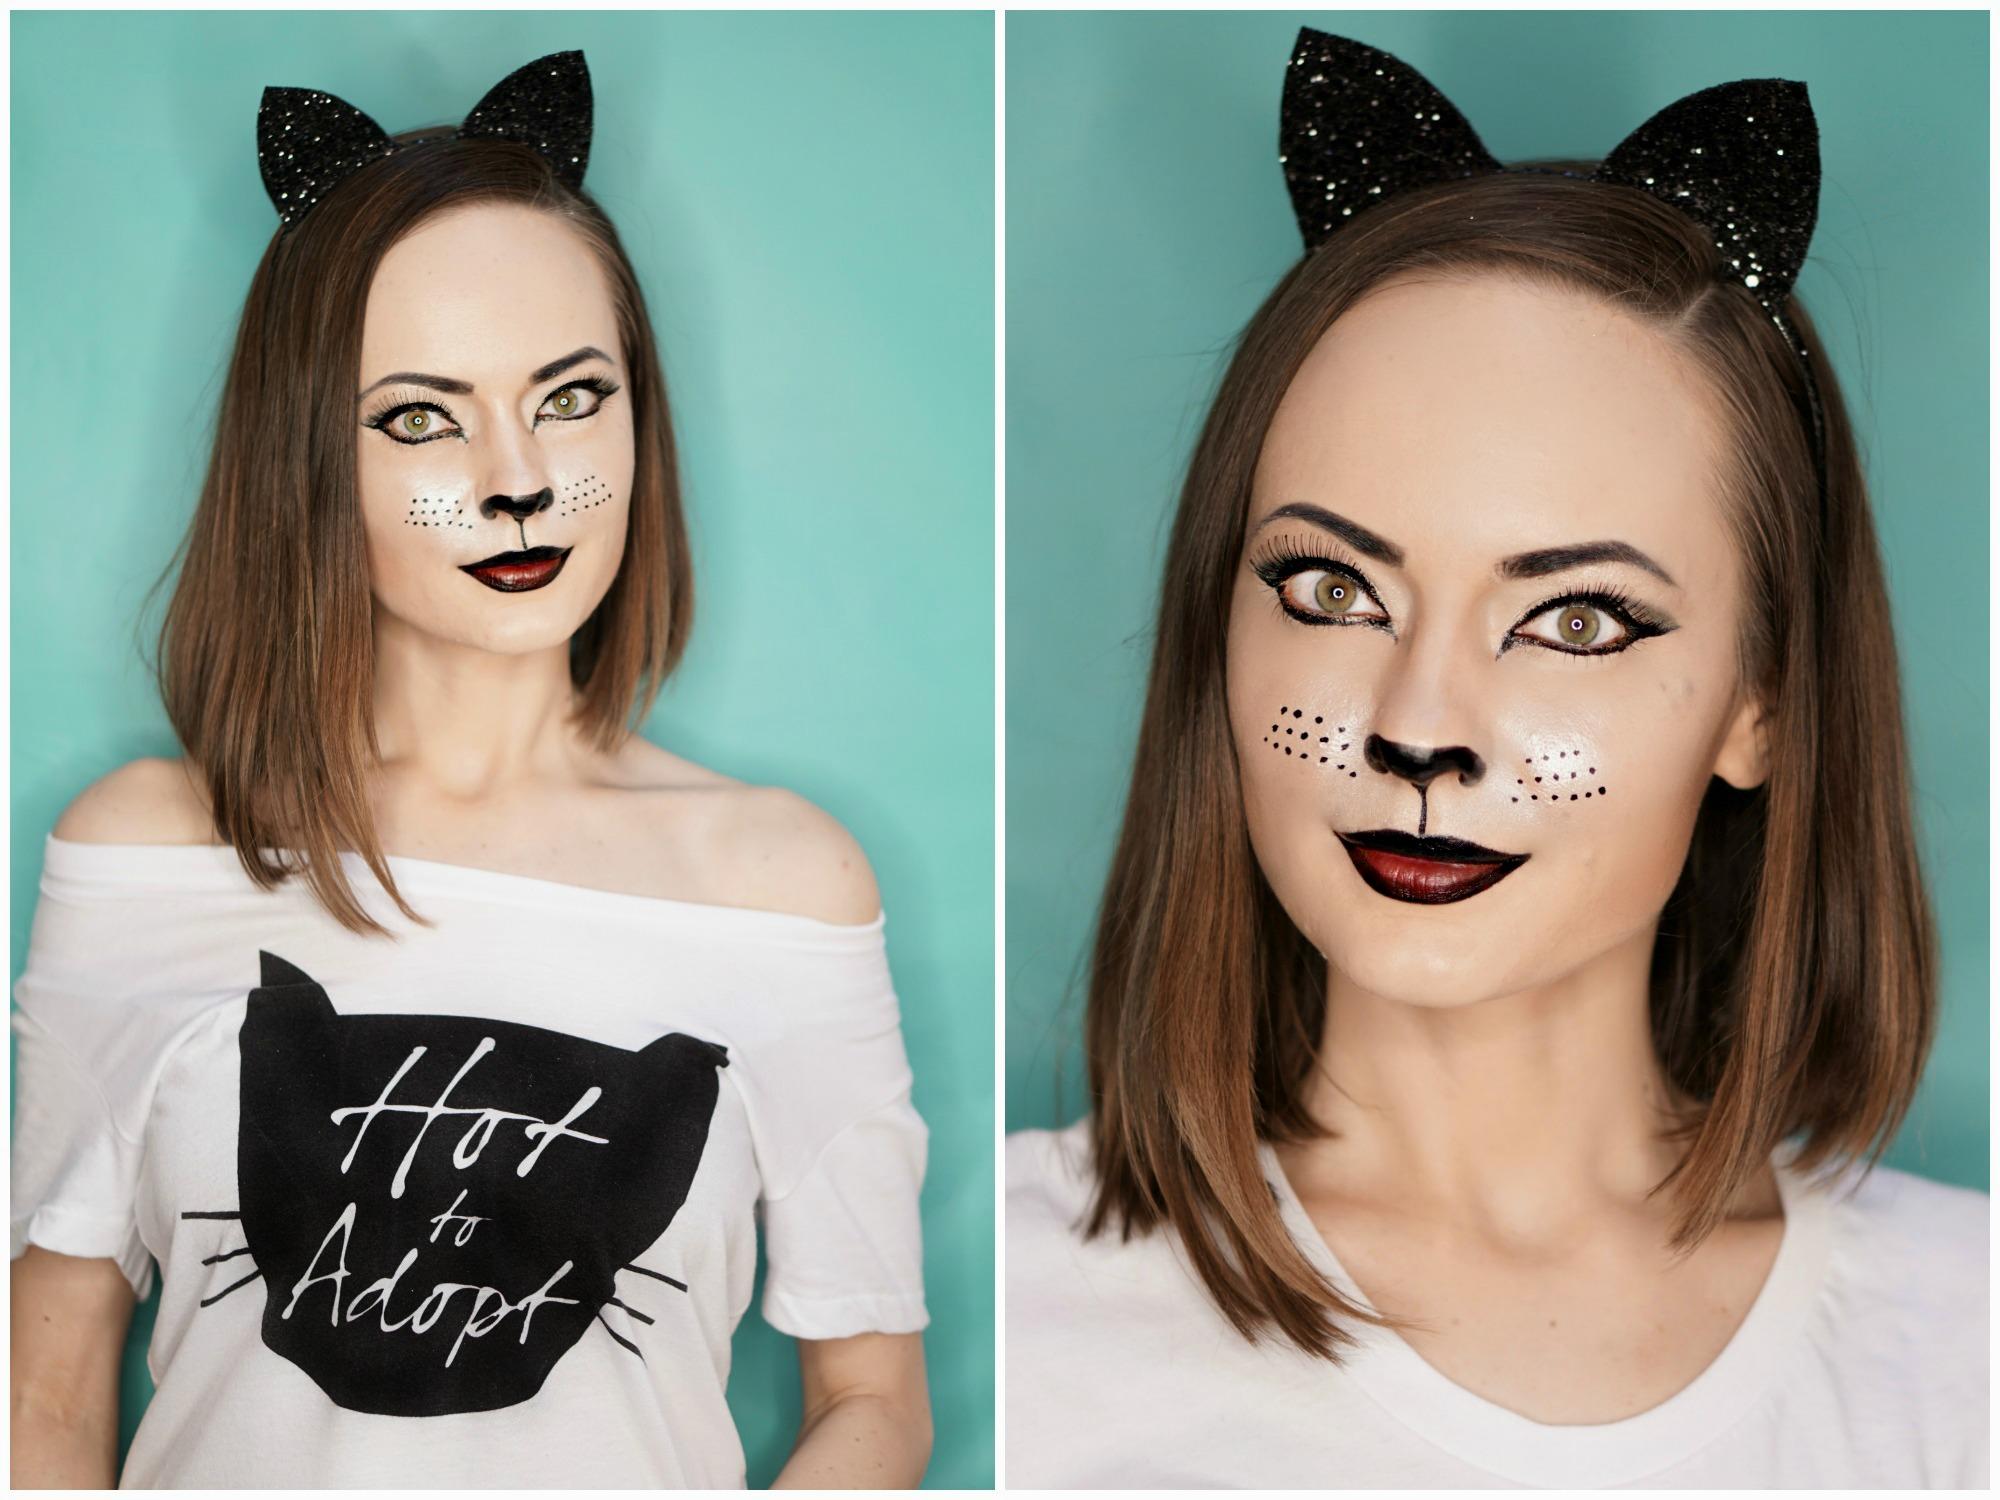 como conseguir un maquillaje sexy y fatal para las fiestas de Halloween, cara pintada de gato paso a paso